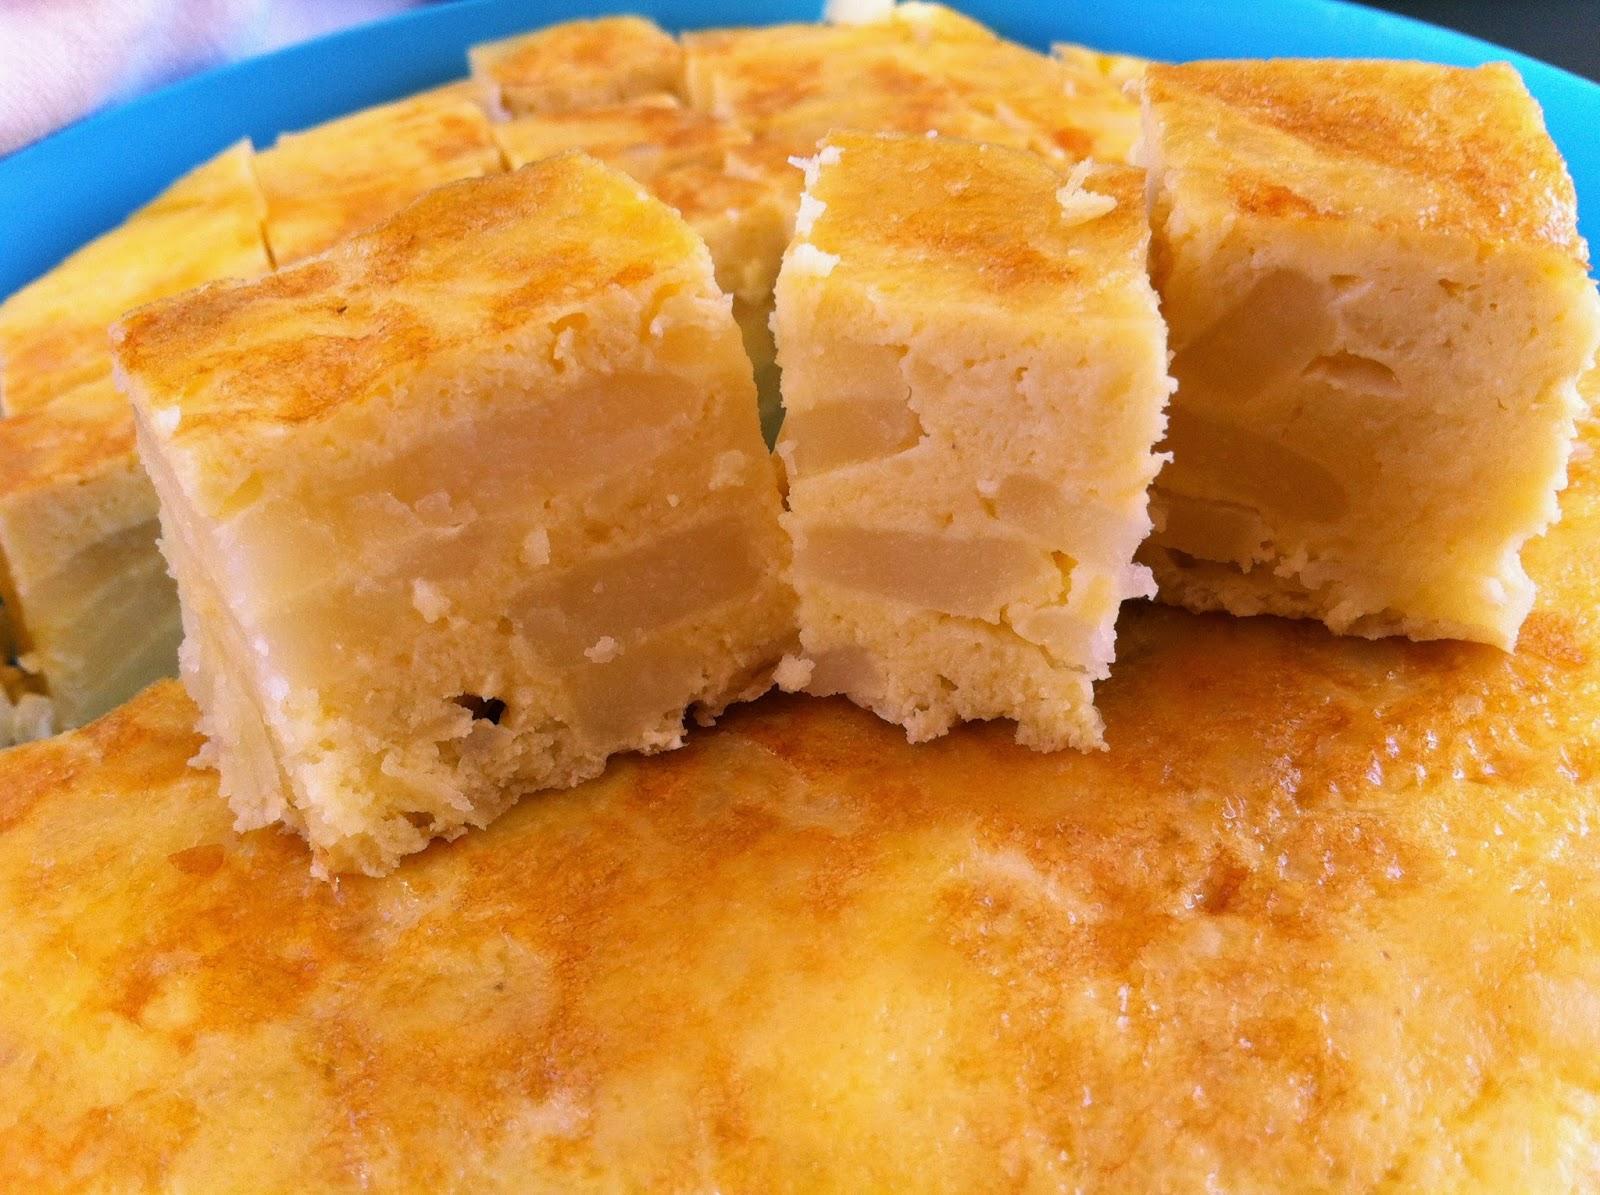 Cocina como mam tortilla de patatas sin cebolla thermomix 31 - Alternativas thermomix ...